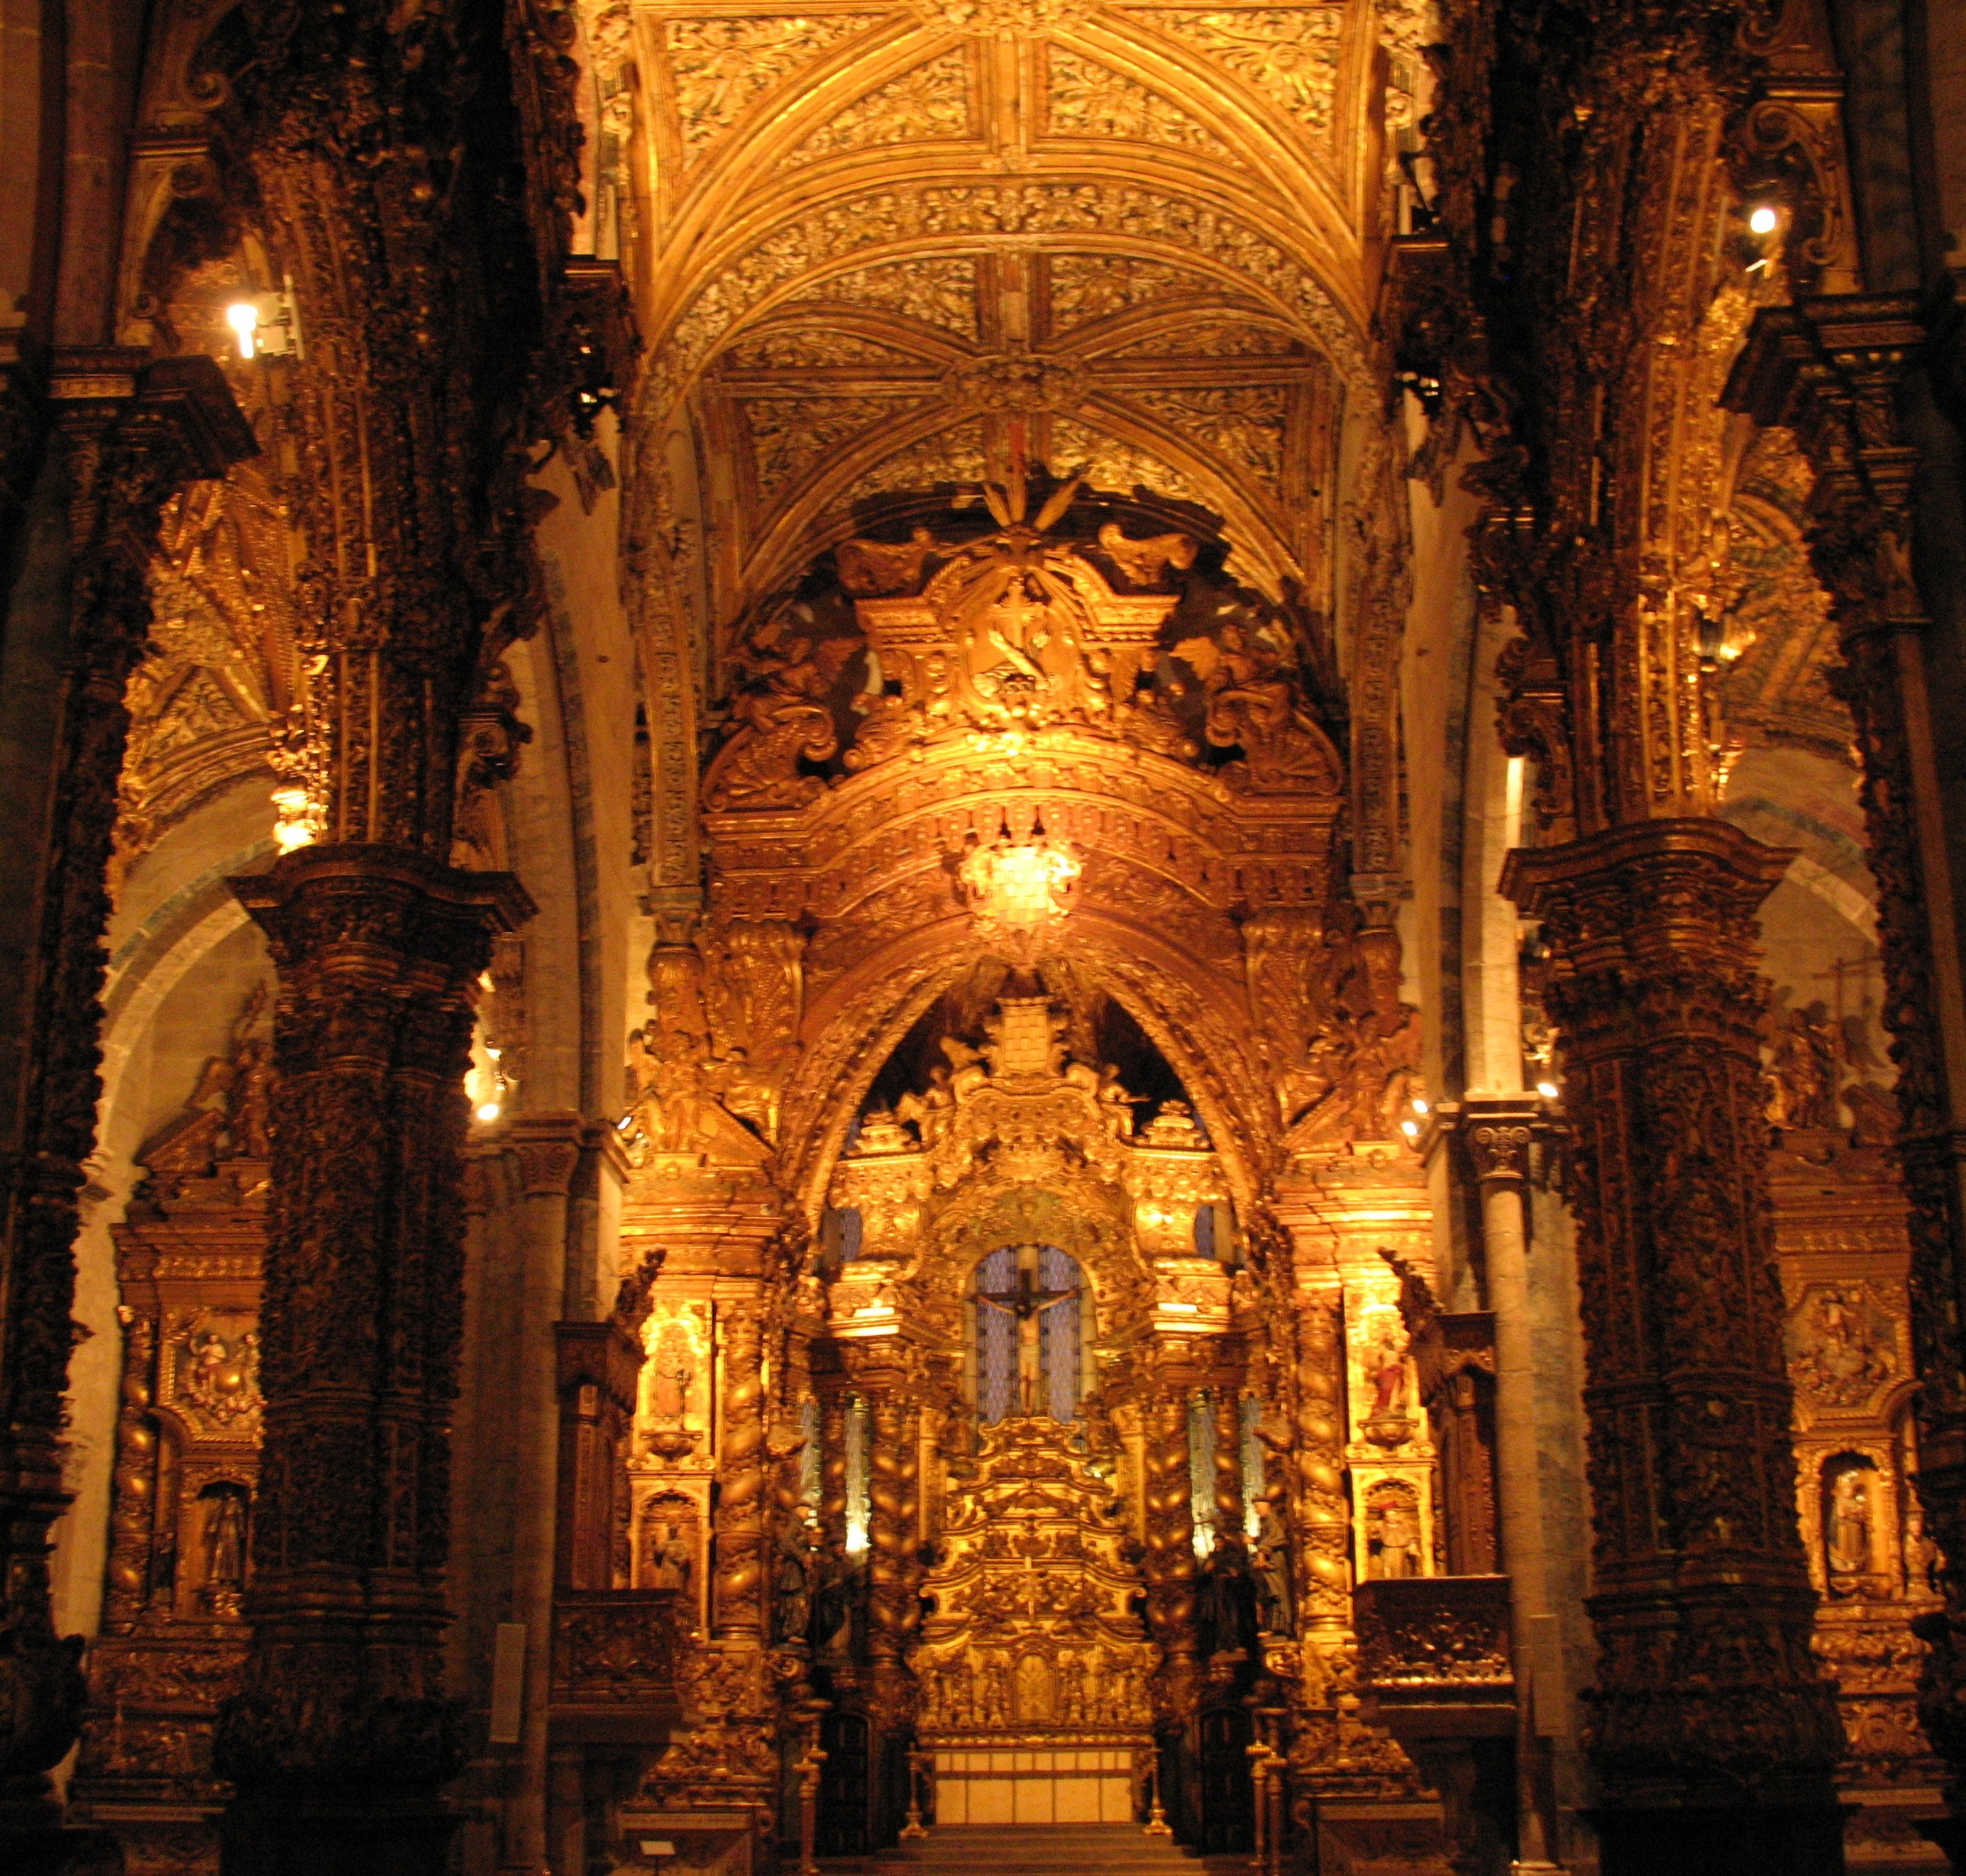 CHURCH OF ST FRANCIS; PORTO